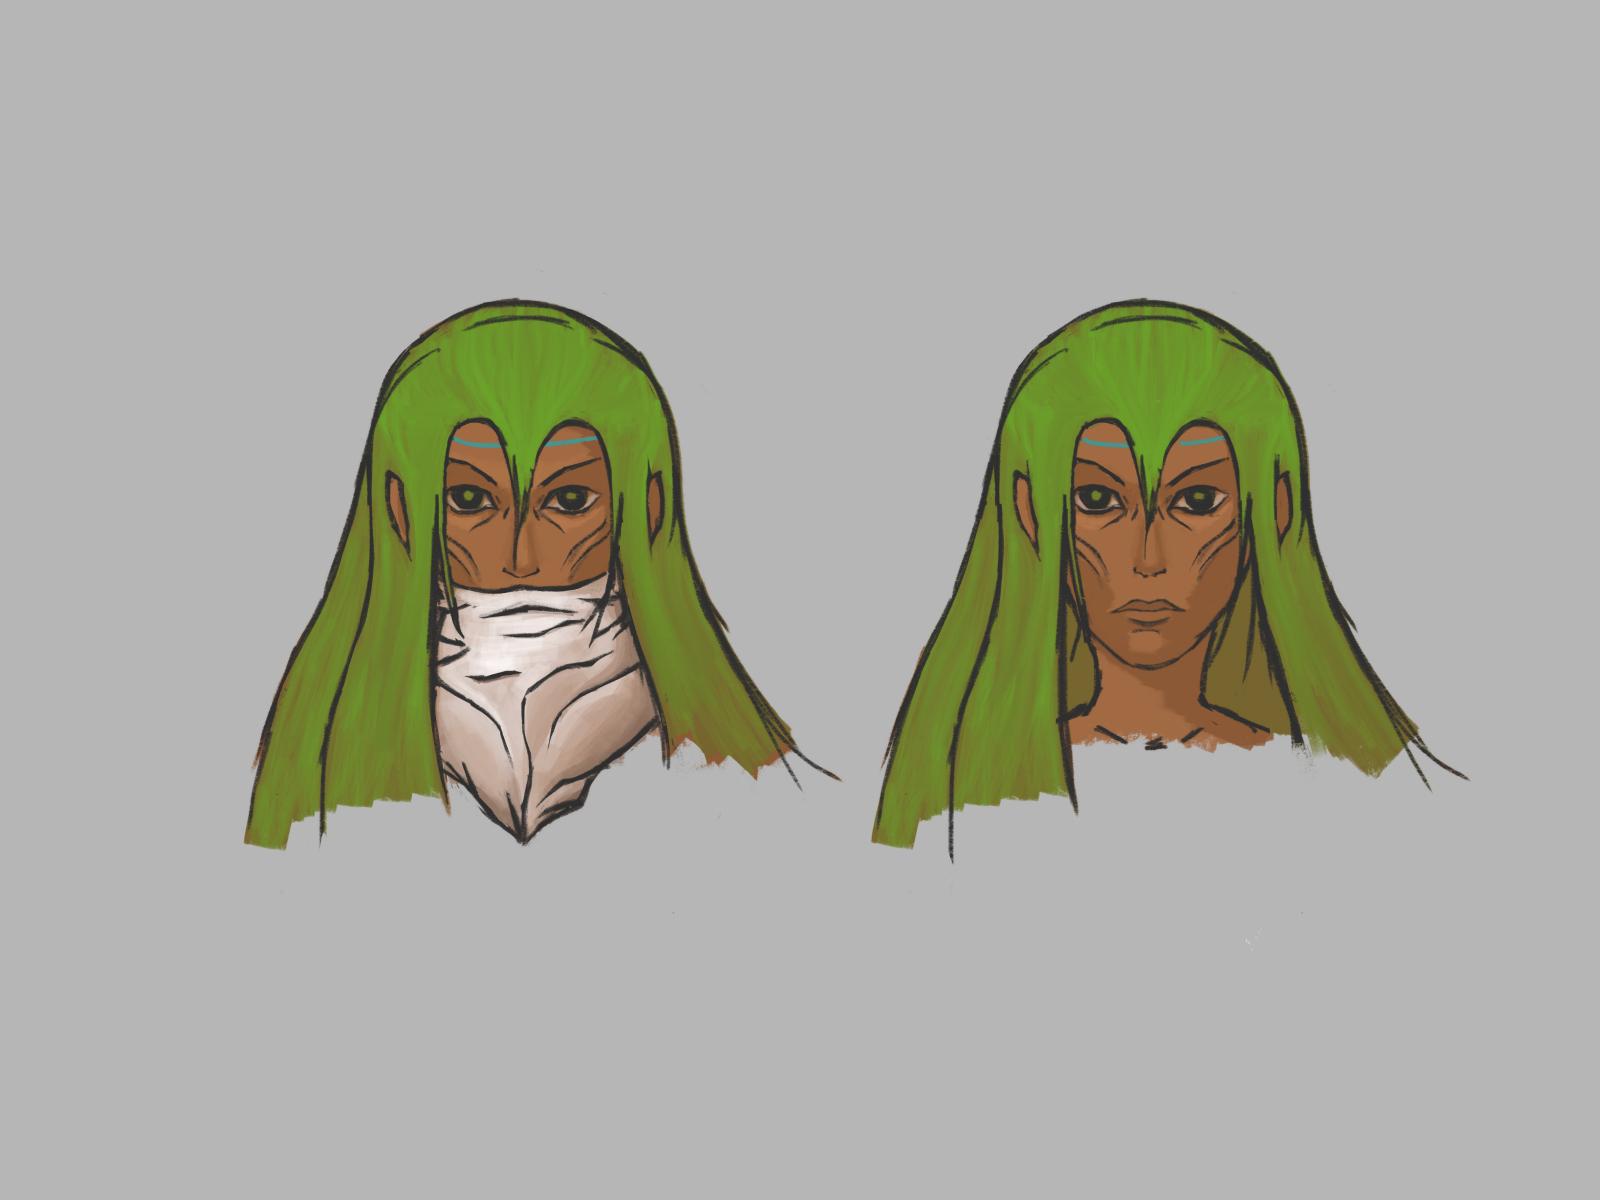 Arieya - Character face